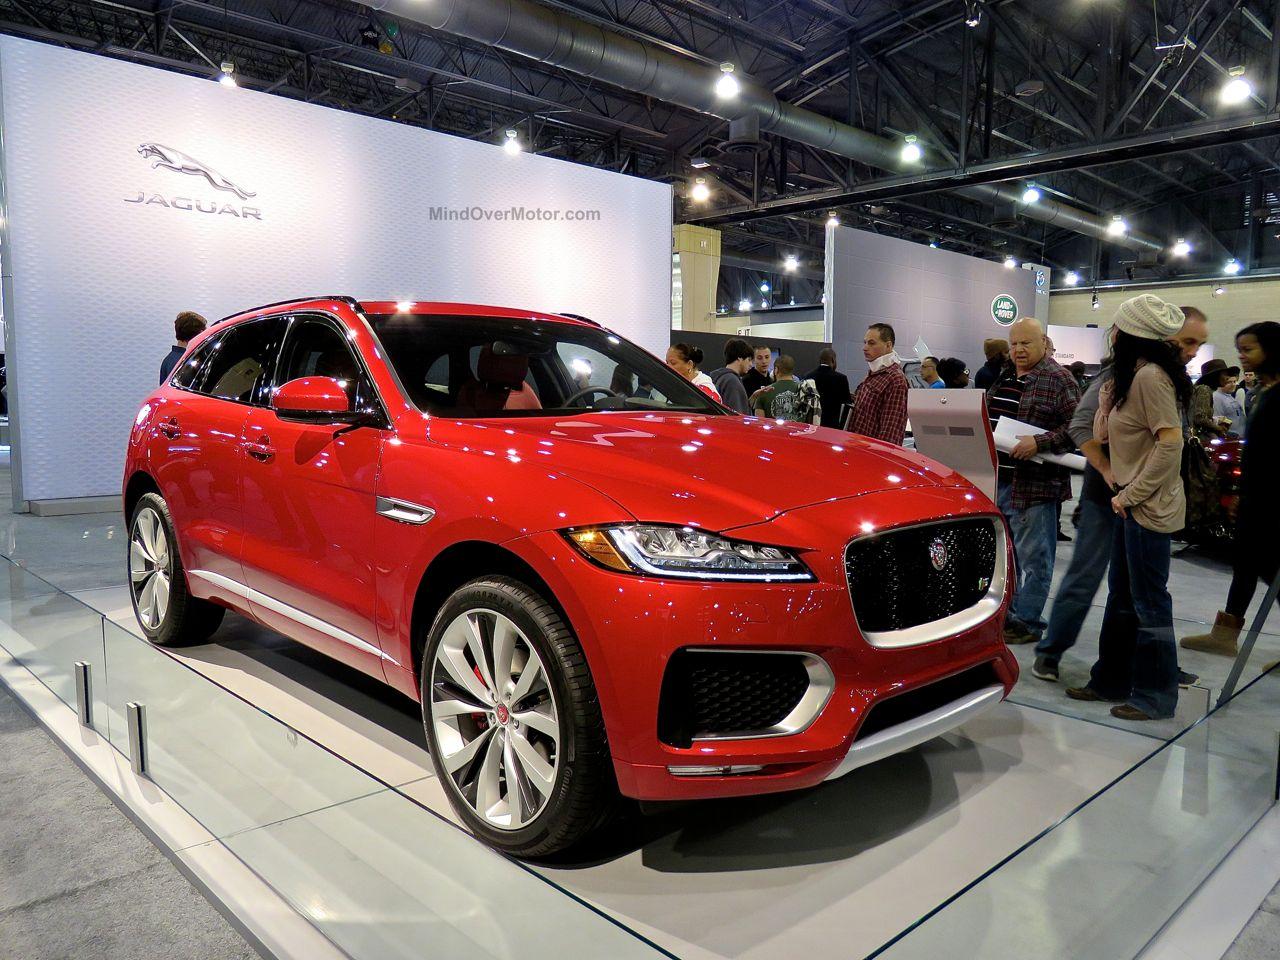 Philly Auto Show 2016 Jaguar F-Pace SUV